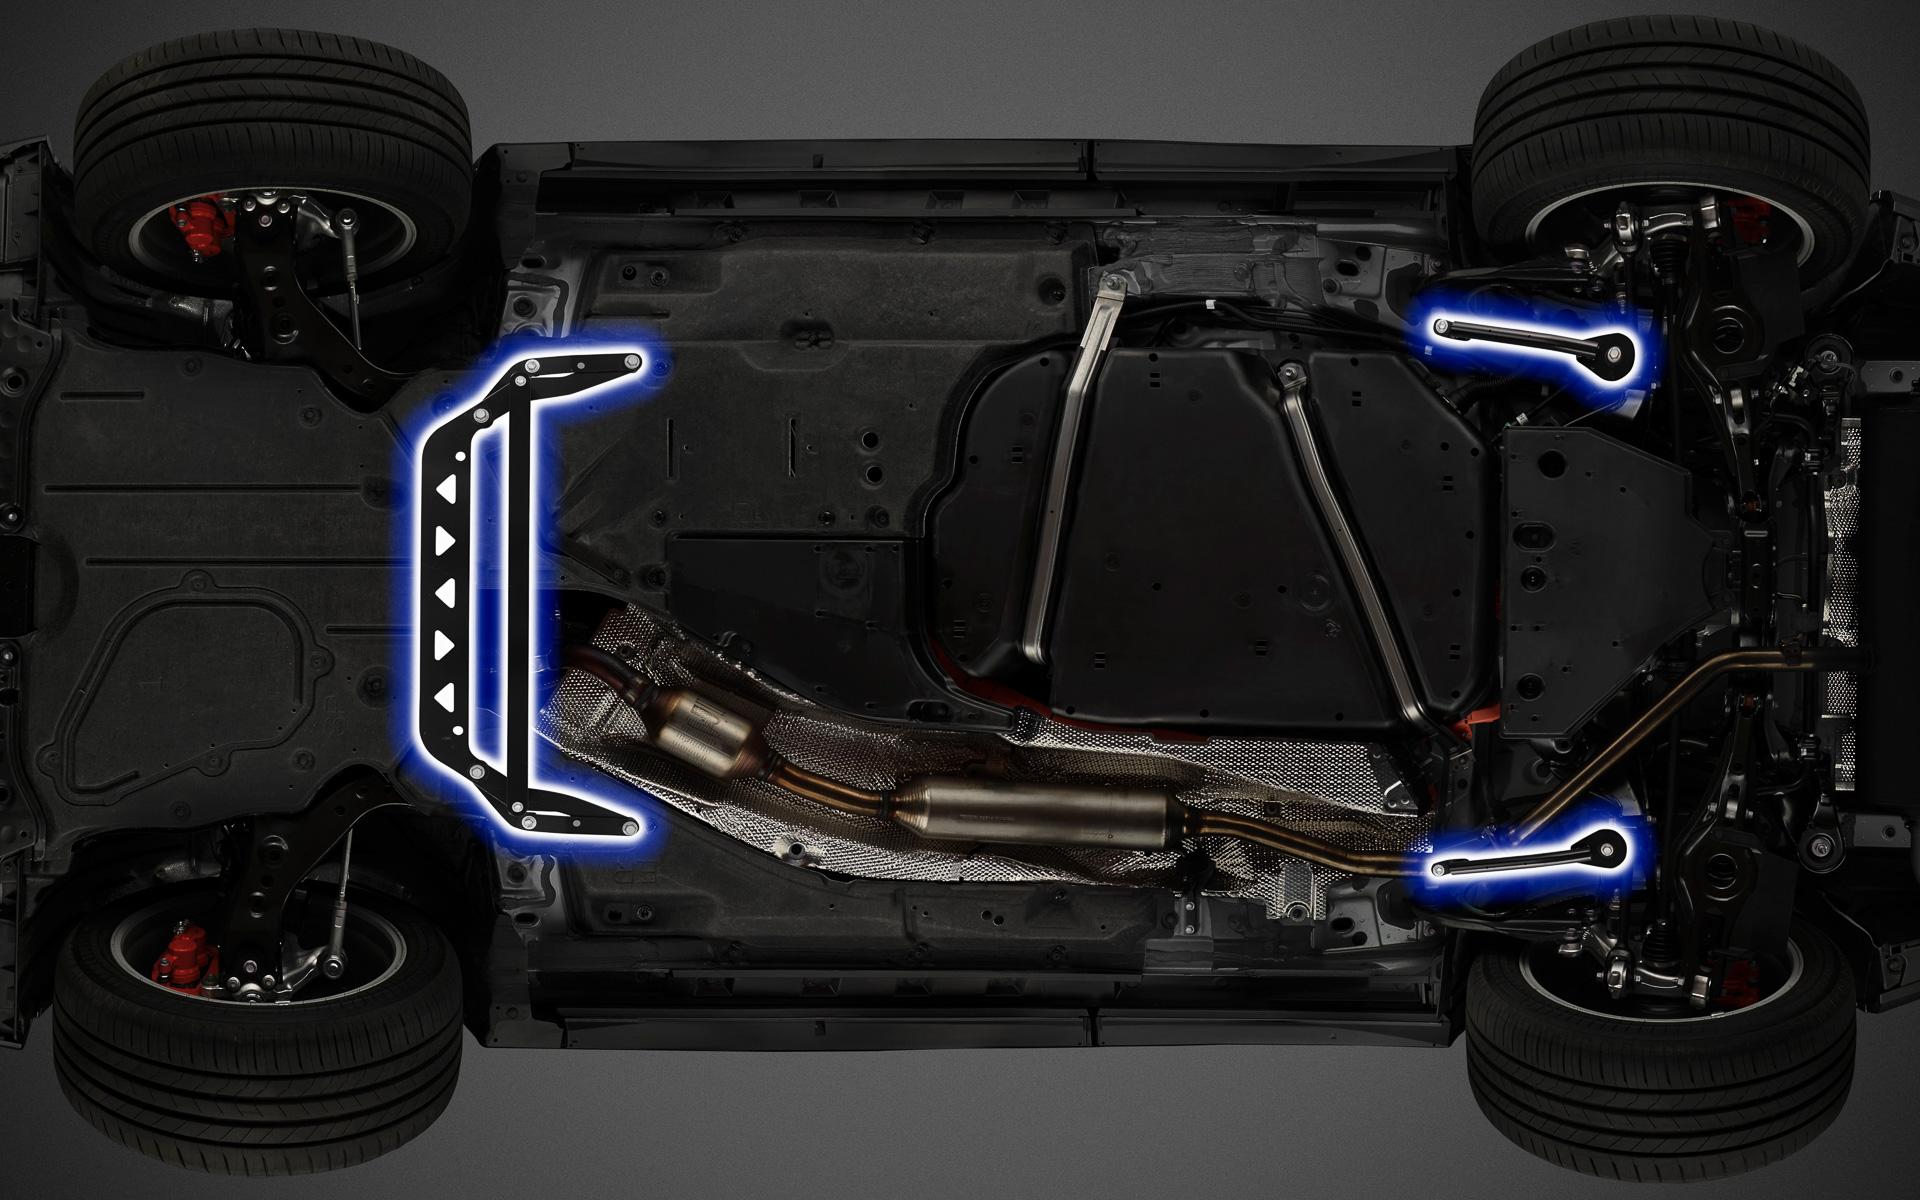 Lexus-NX-TRD-parts-10